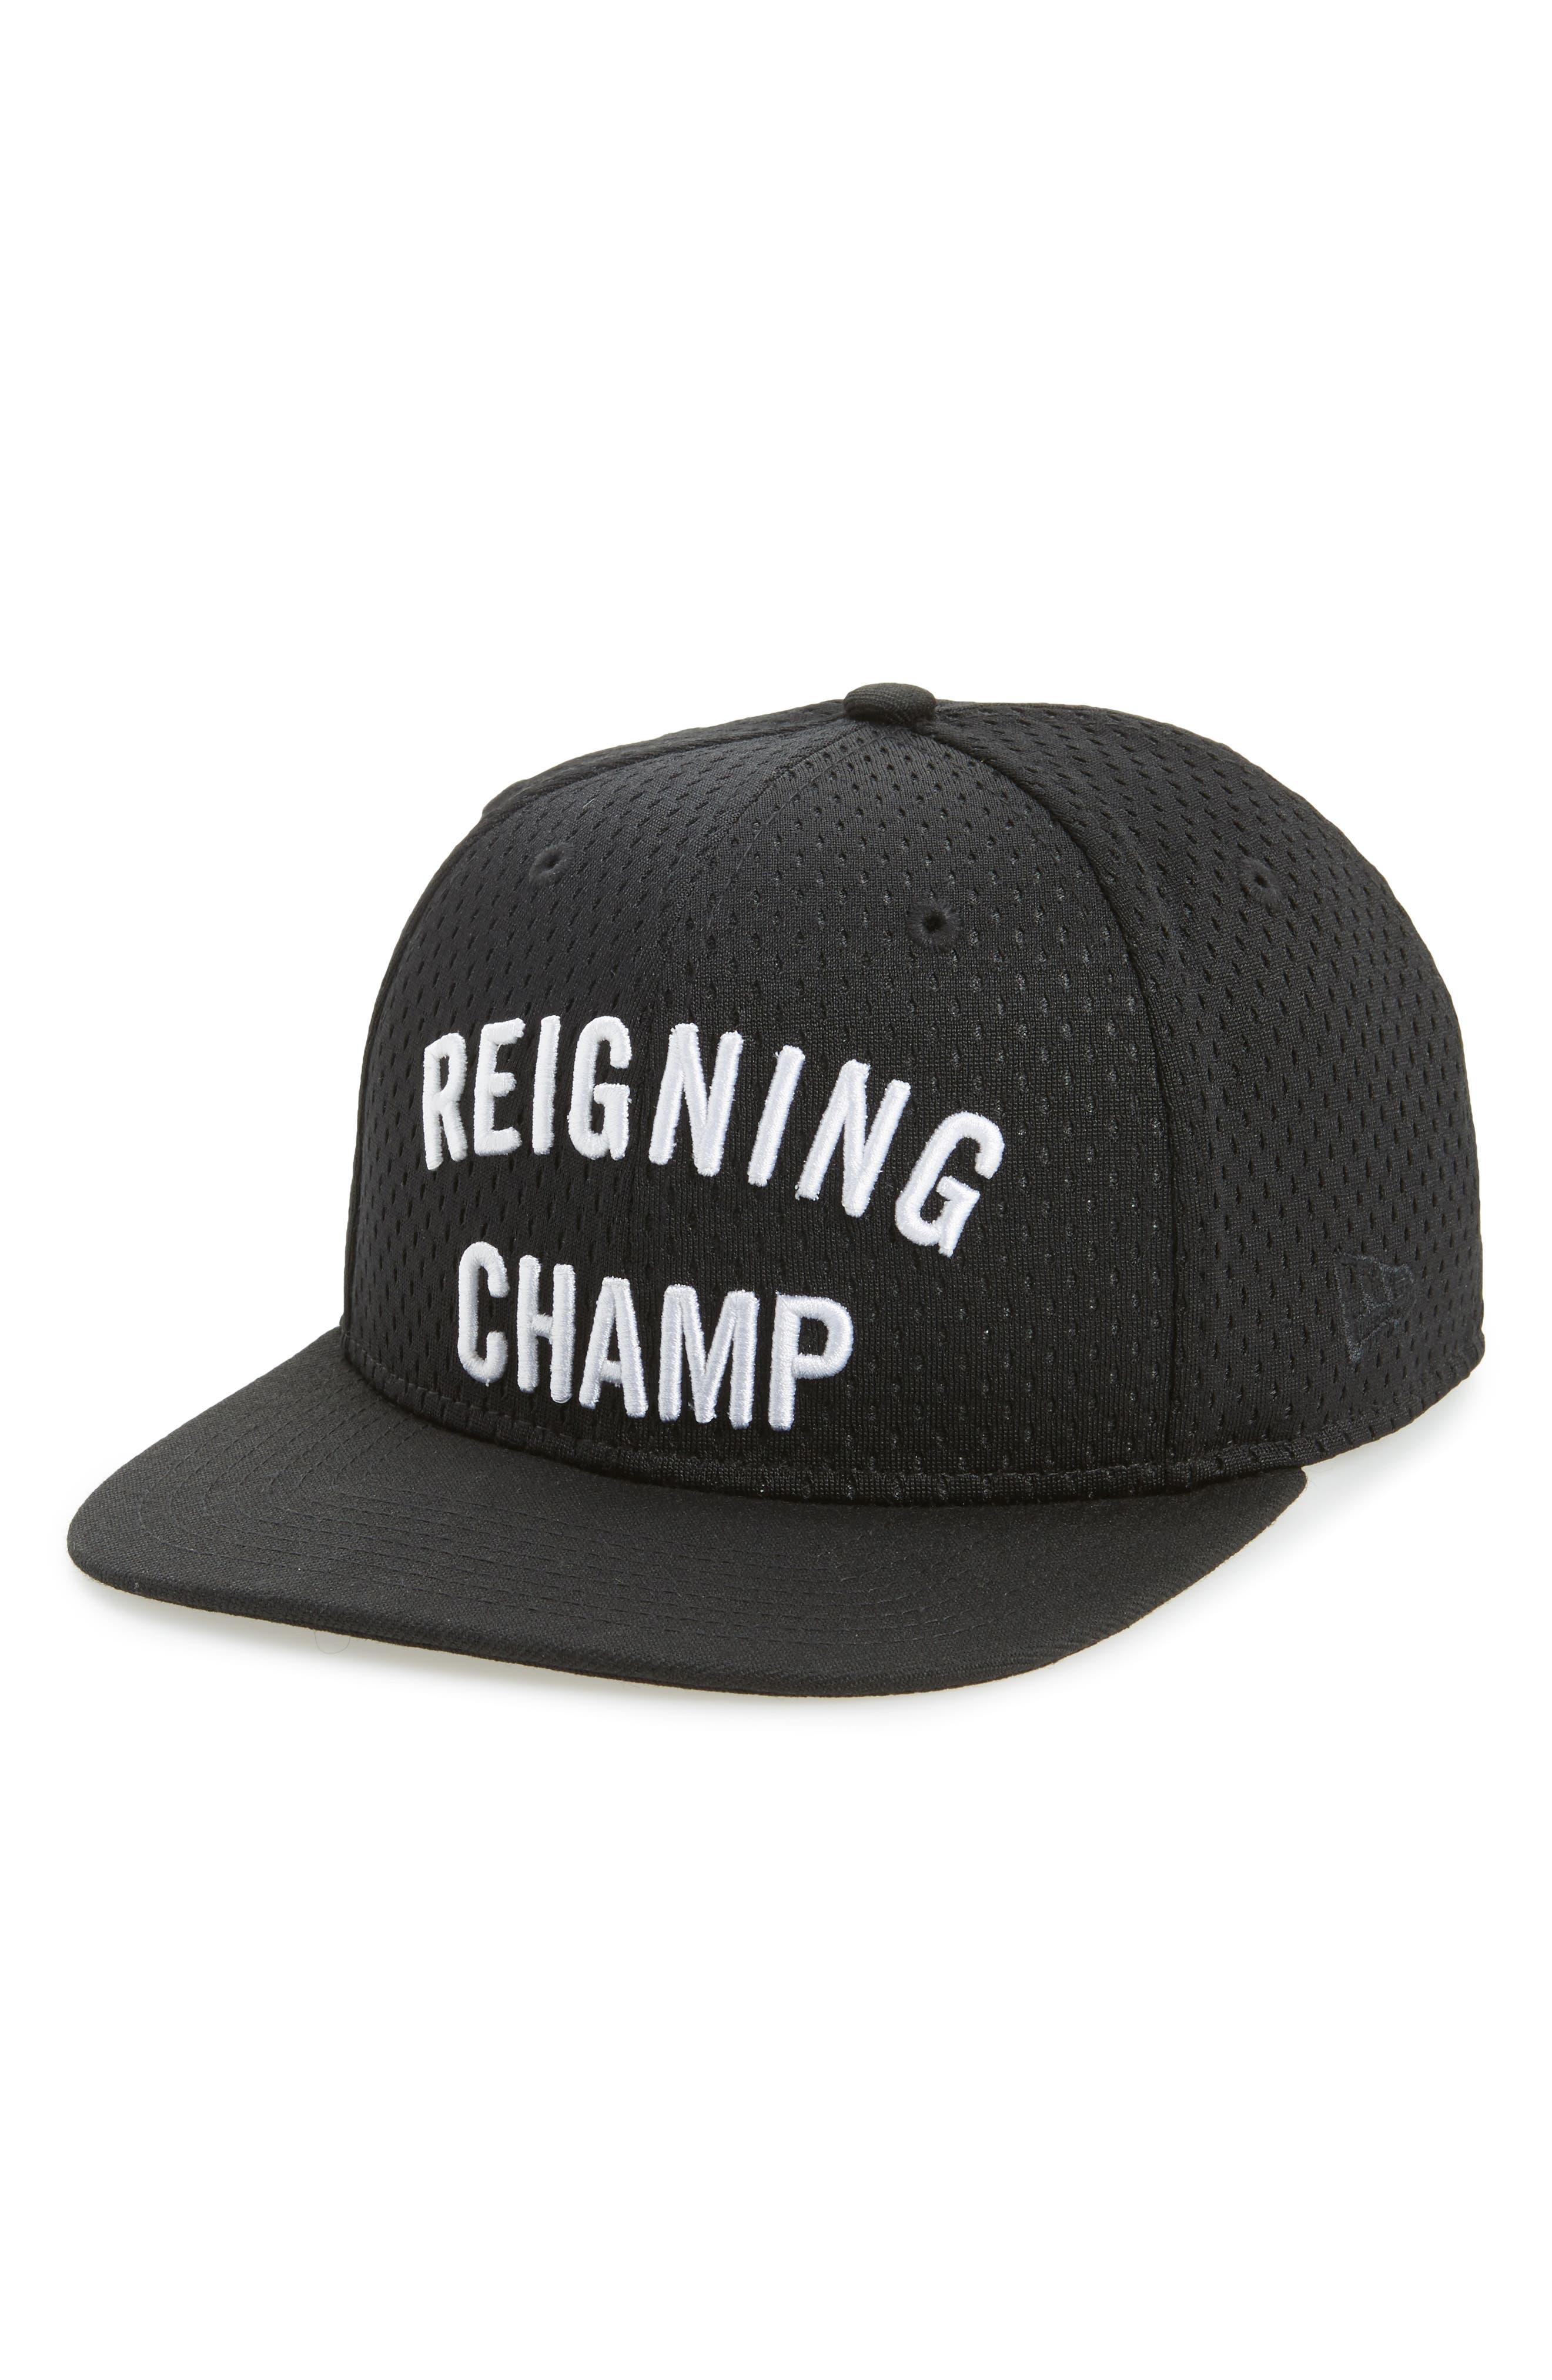 Main Image - Reigning Champ Snapback Baseball Cap